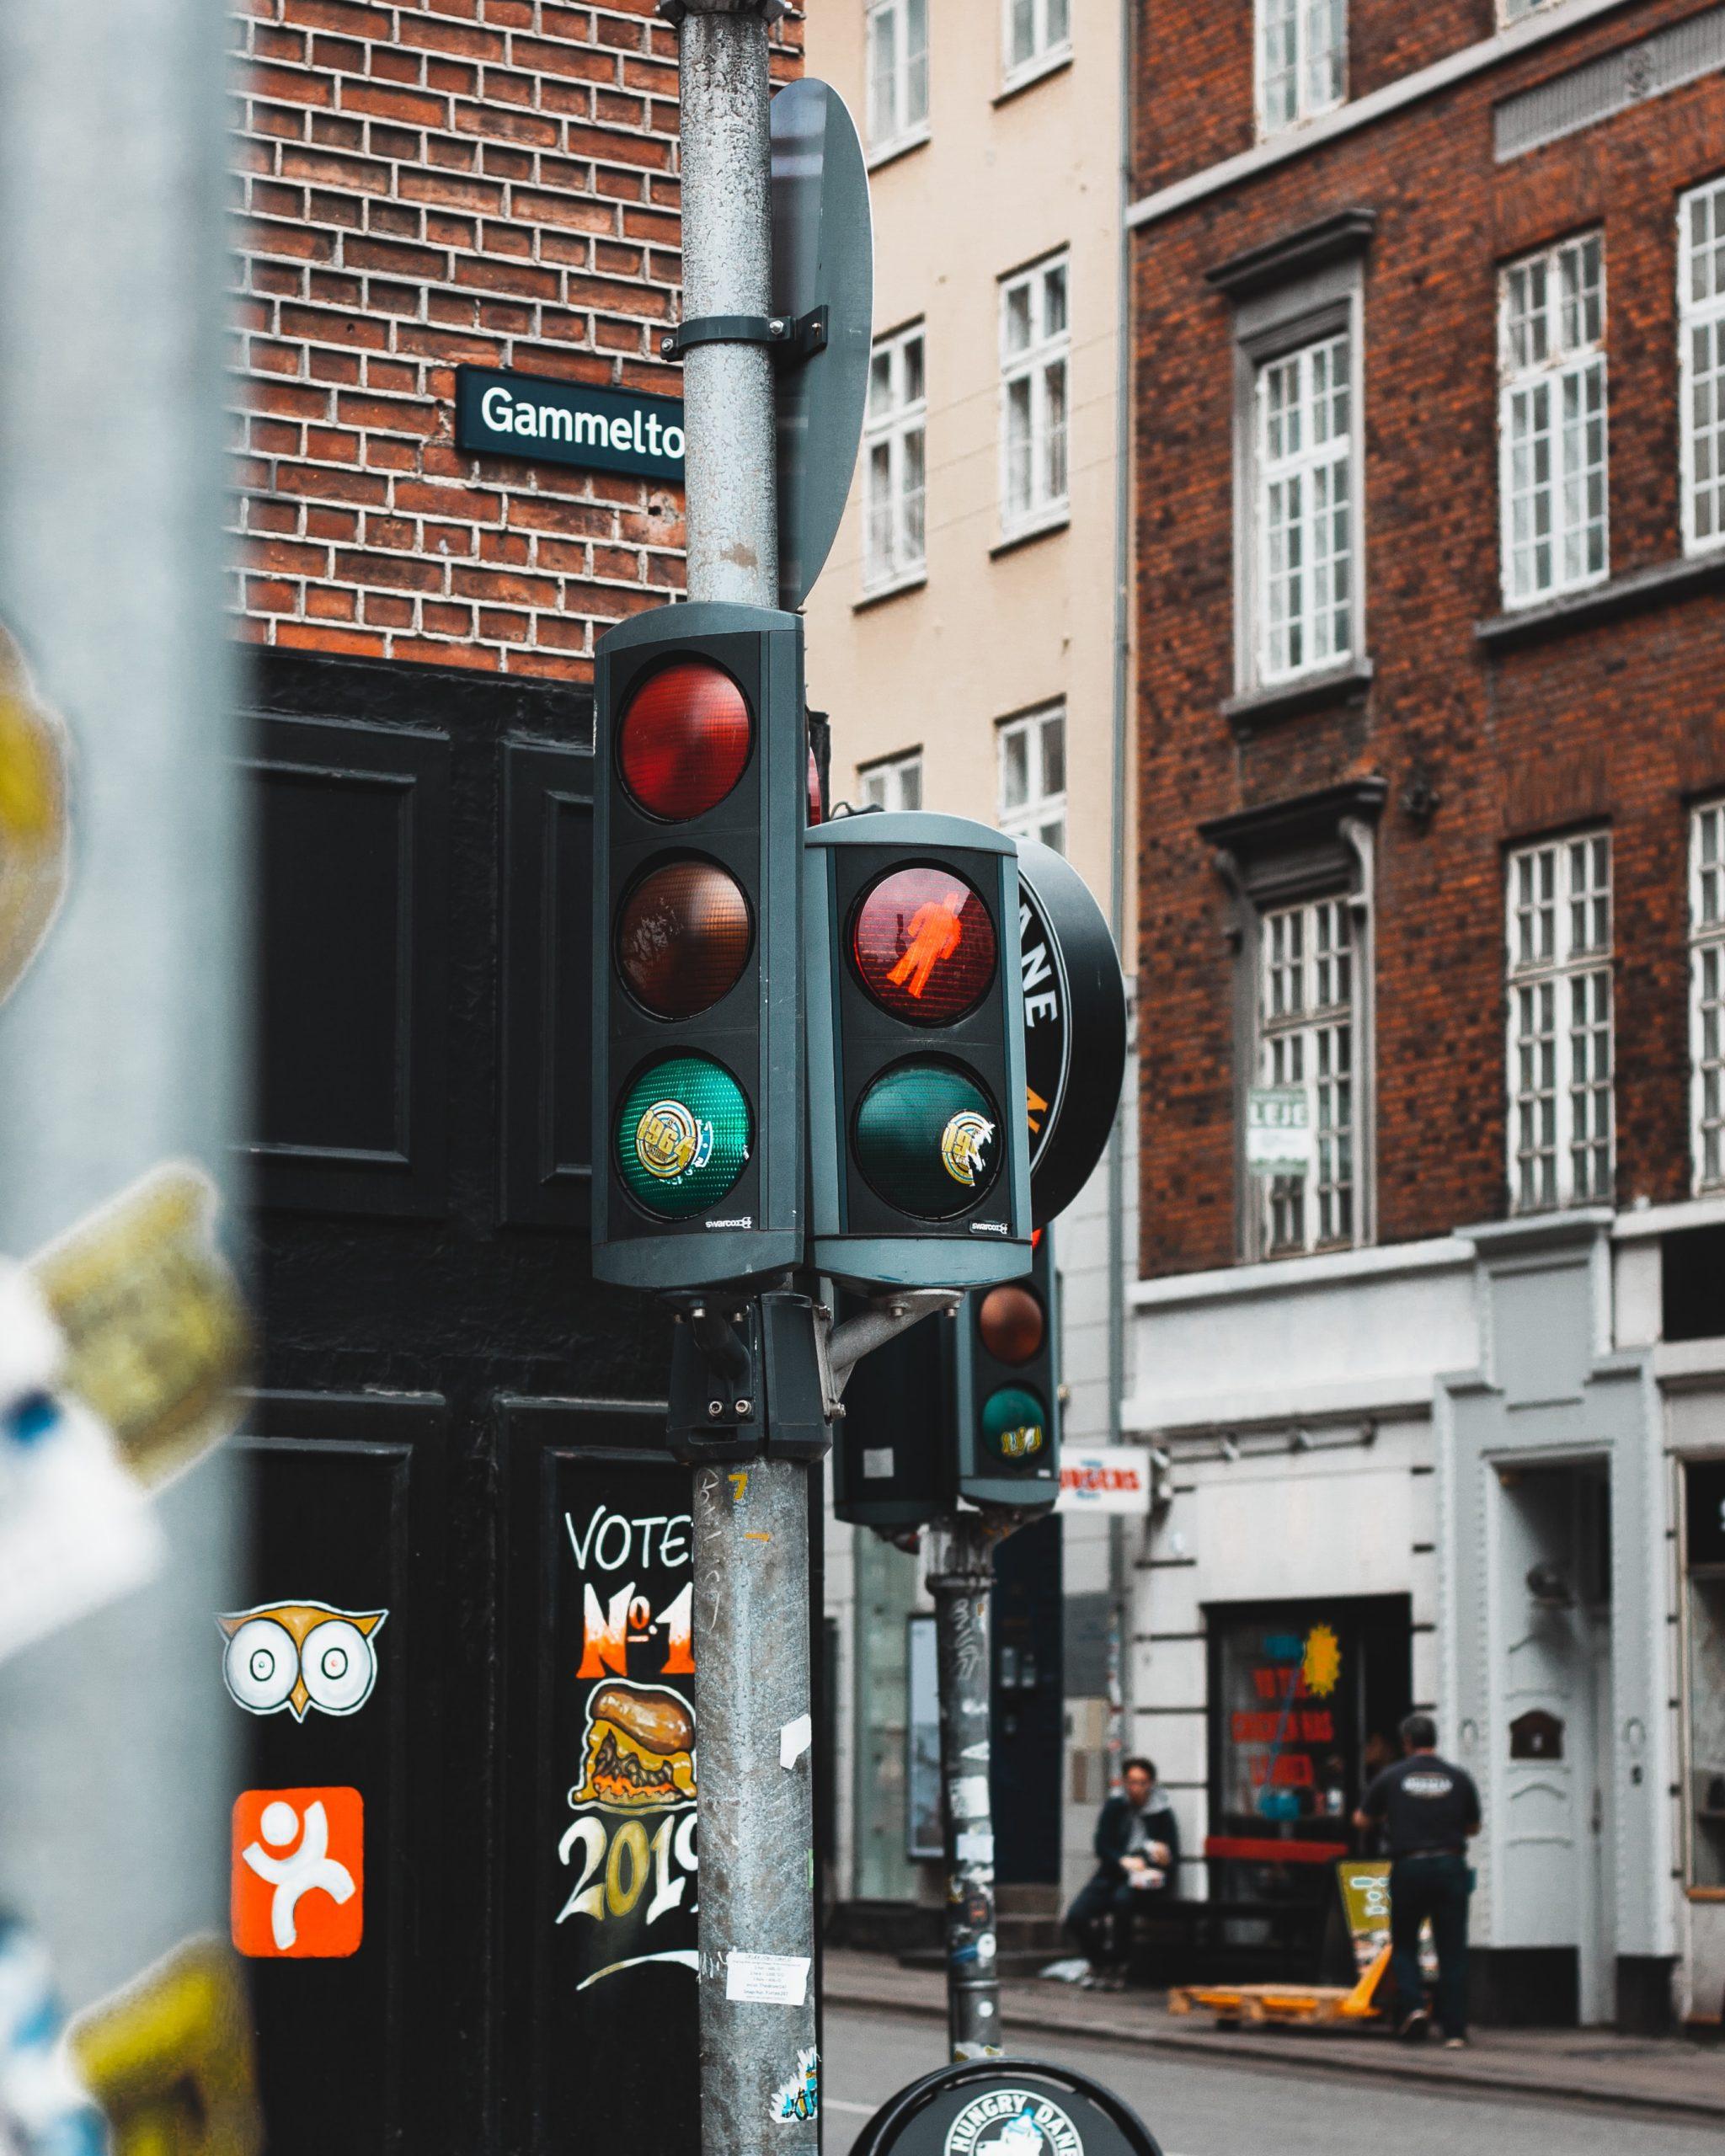 turned-off traffic light